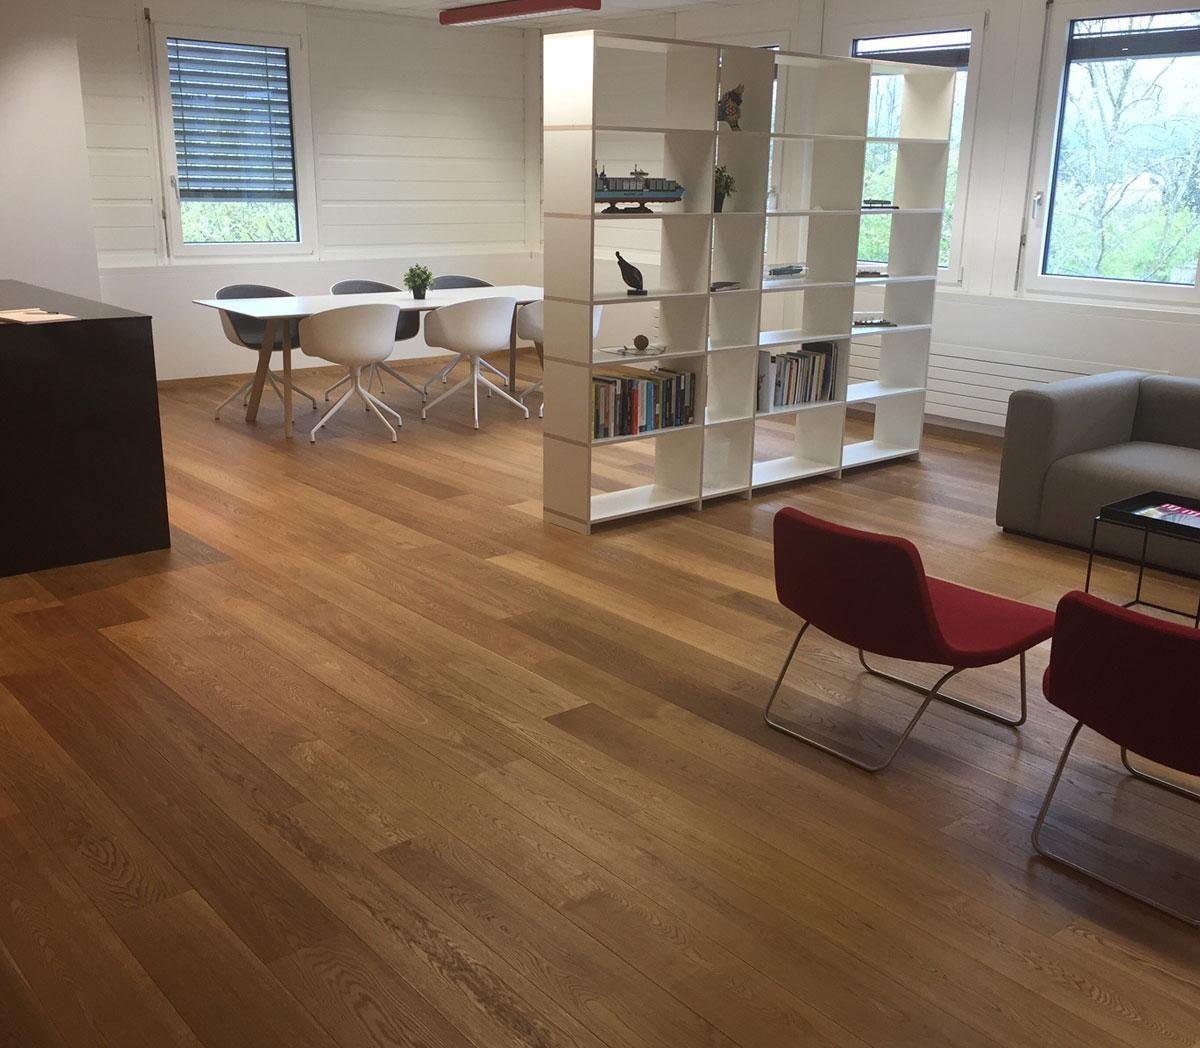 Ferrer Floors Ag - Parkett In Basel Reinach Bodenbeläge Linoleum Pvc